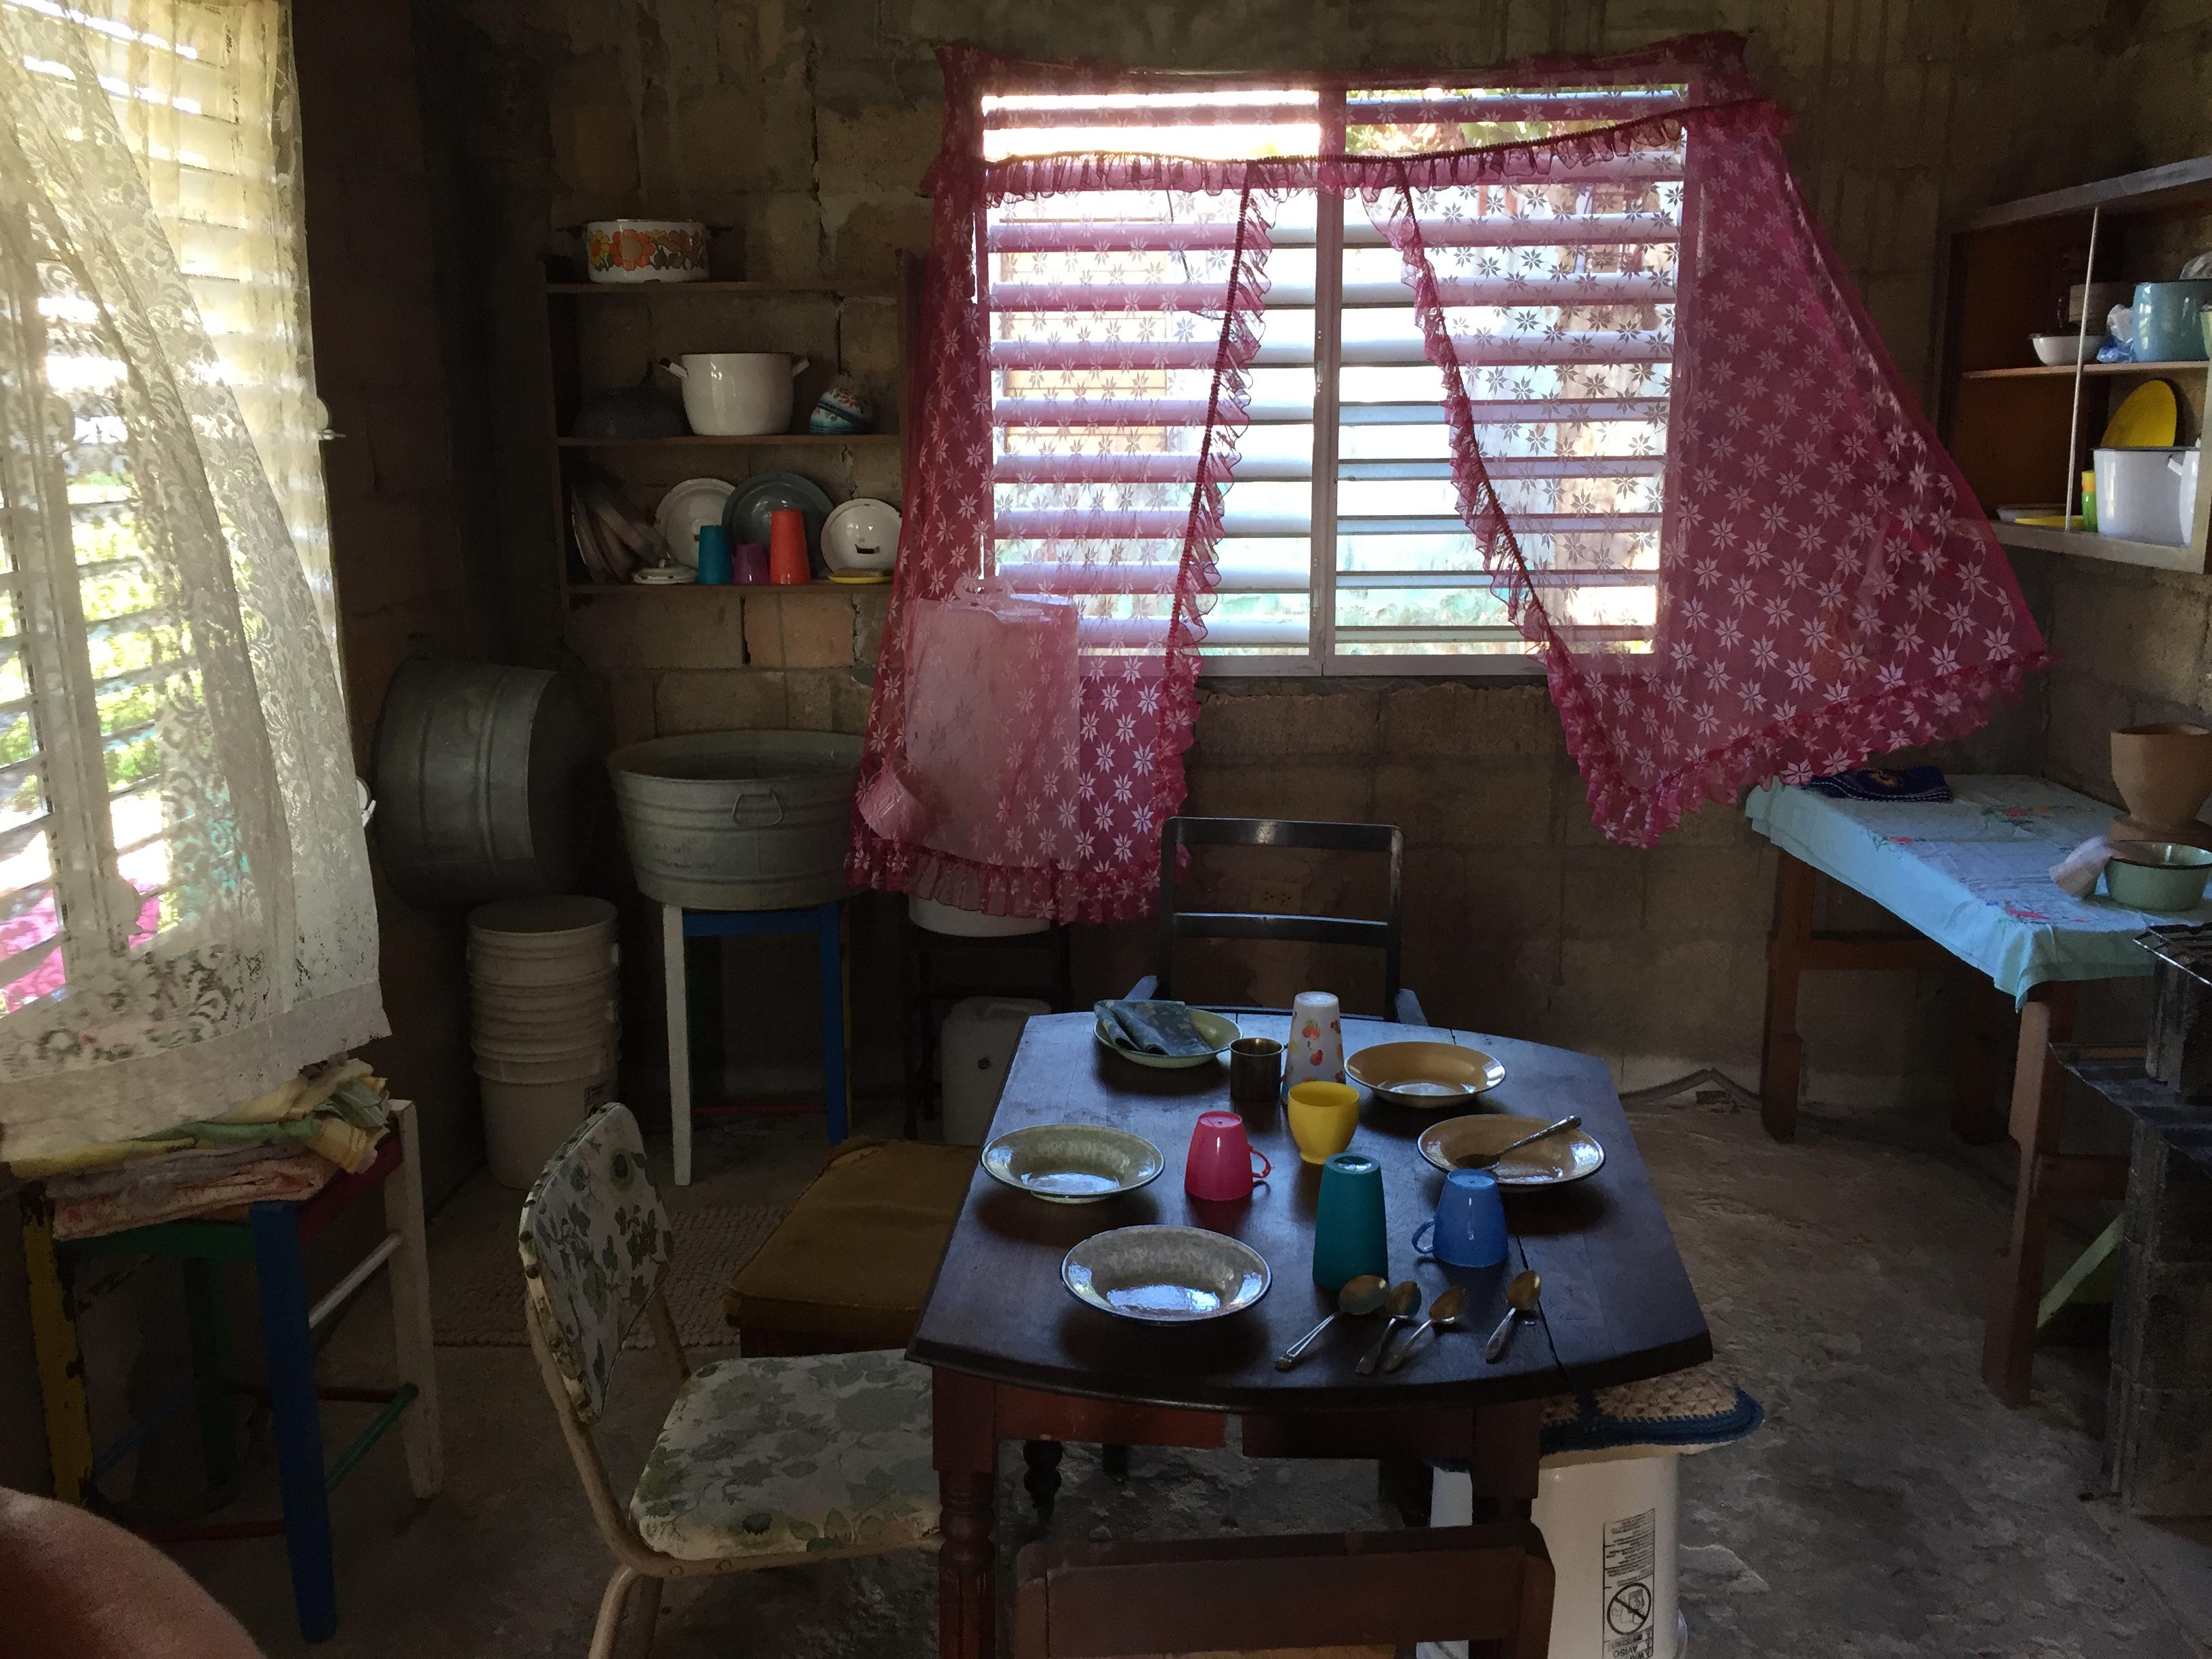 Family kitchen interior set